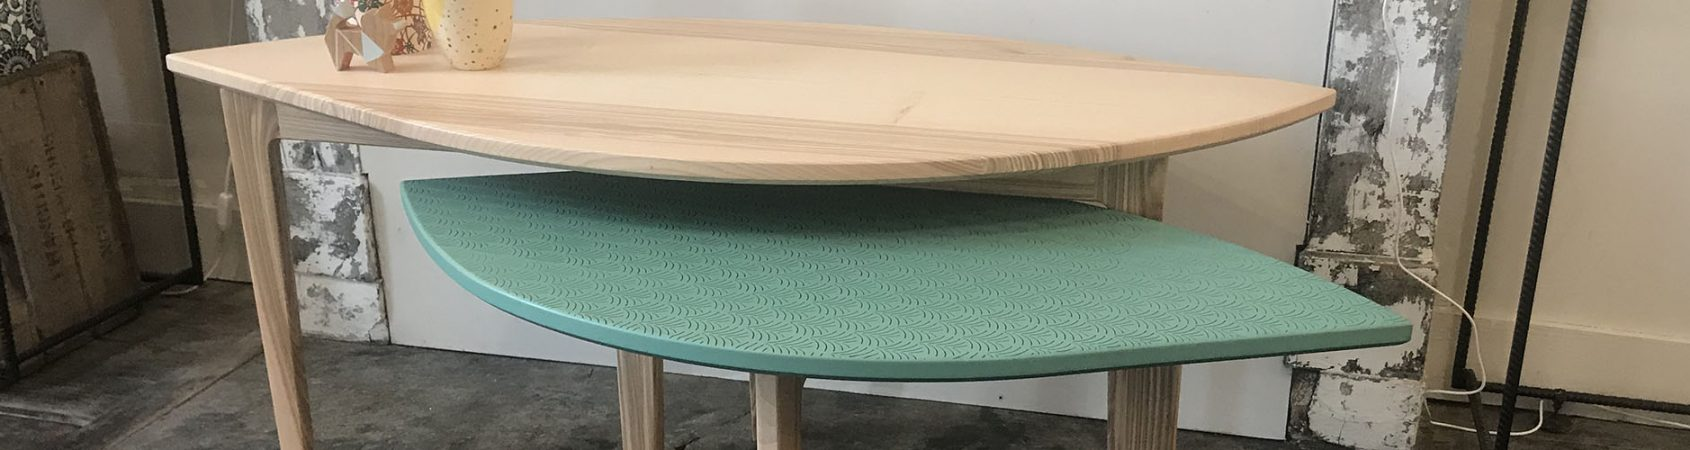 Table-Basse-Alice-présentation